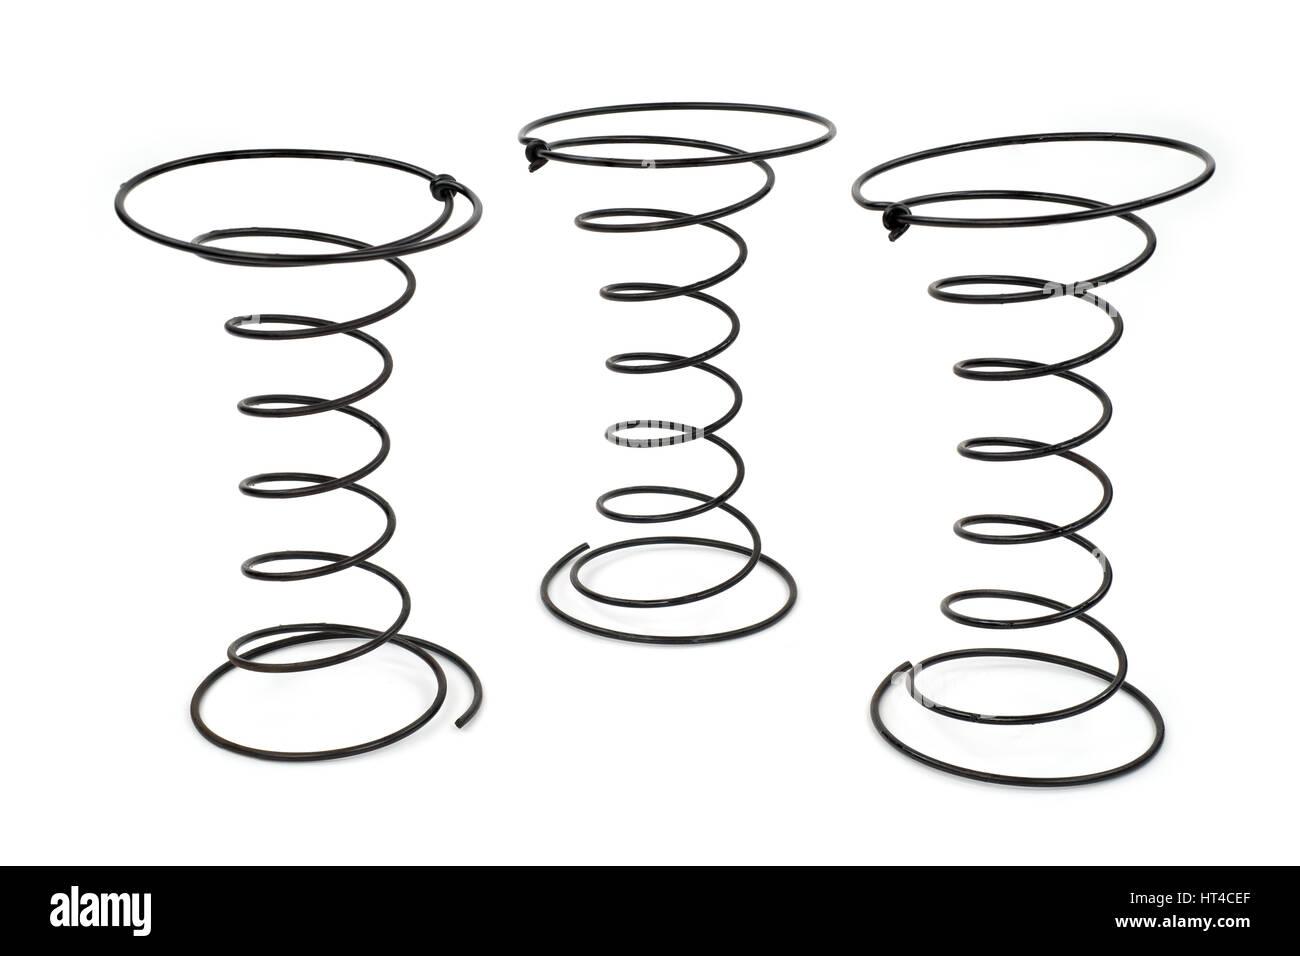 Coil Spring Spiral Steel Stockfotos & Coil Spring Spiral Steel ...